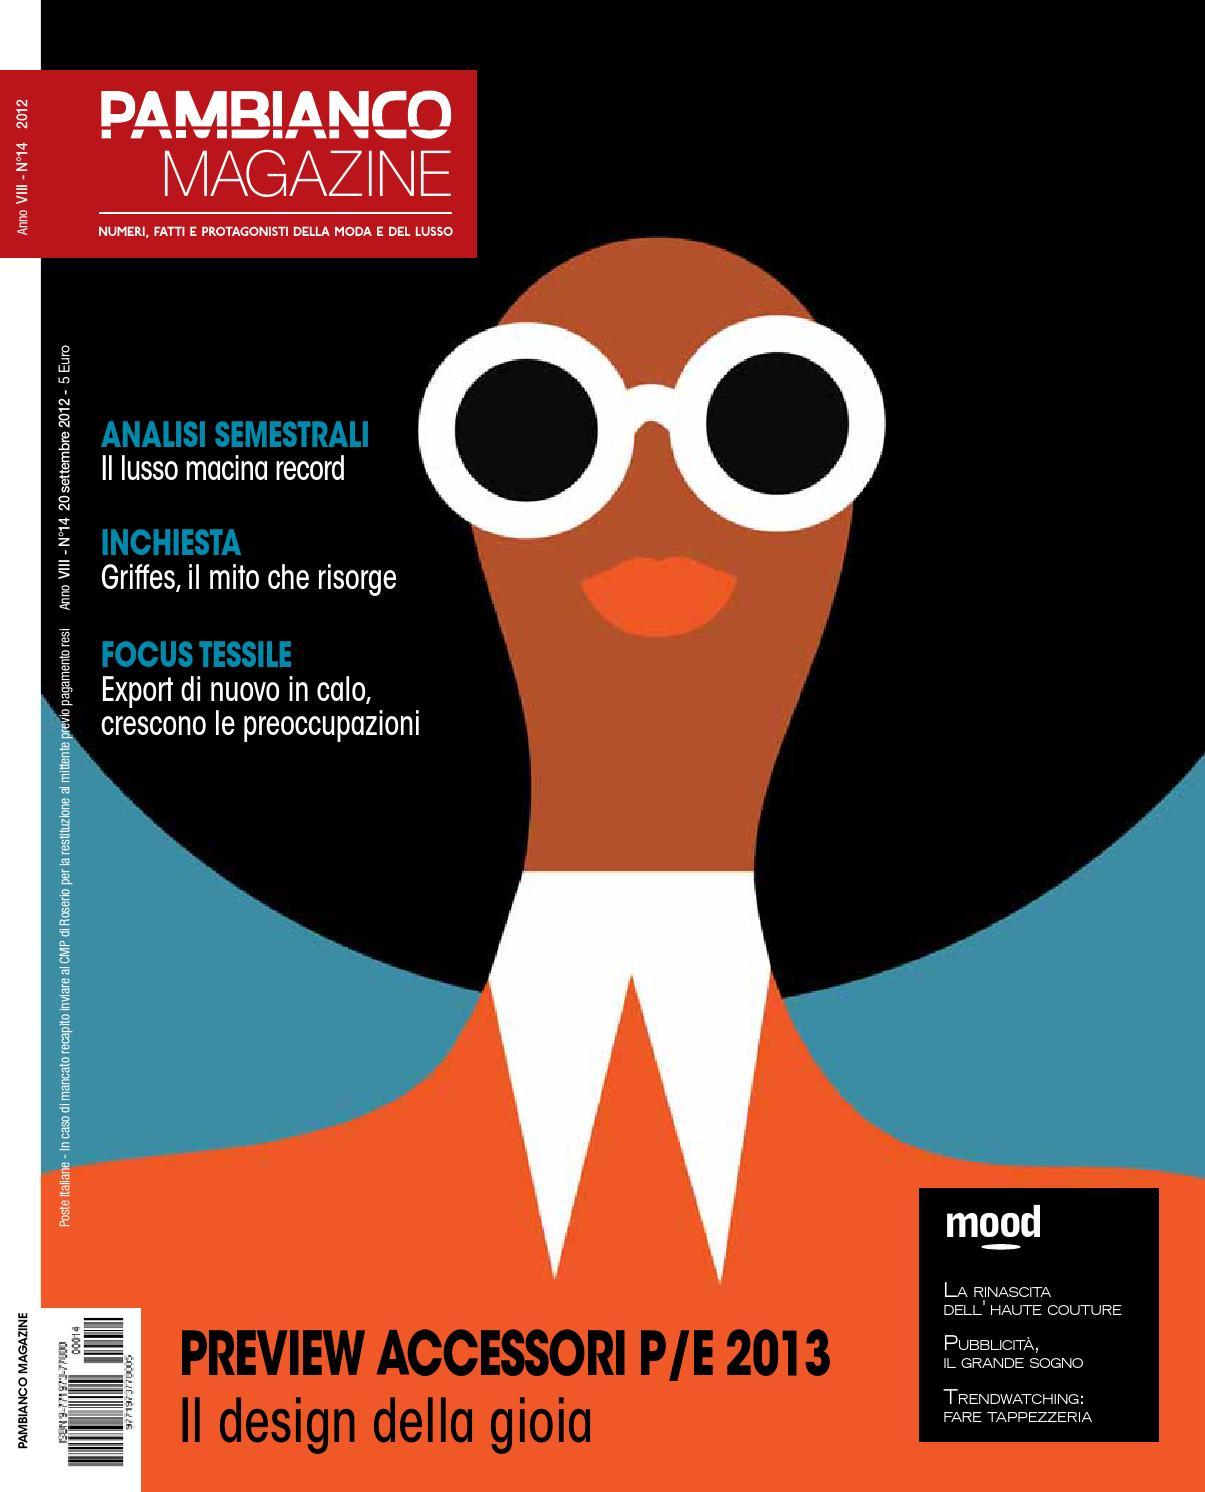 Pambianco magazine N.14 VIII by Pambianconews issuu